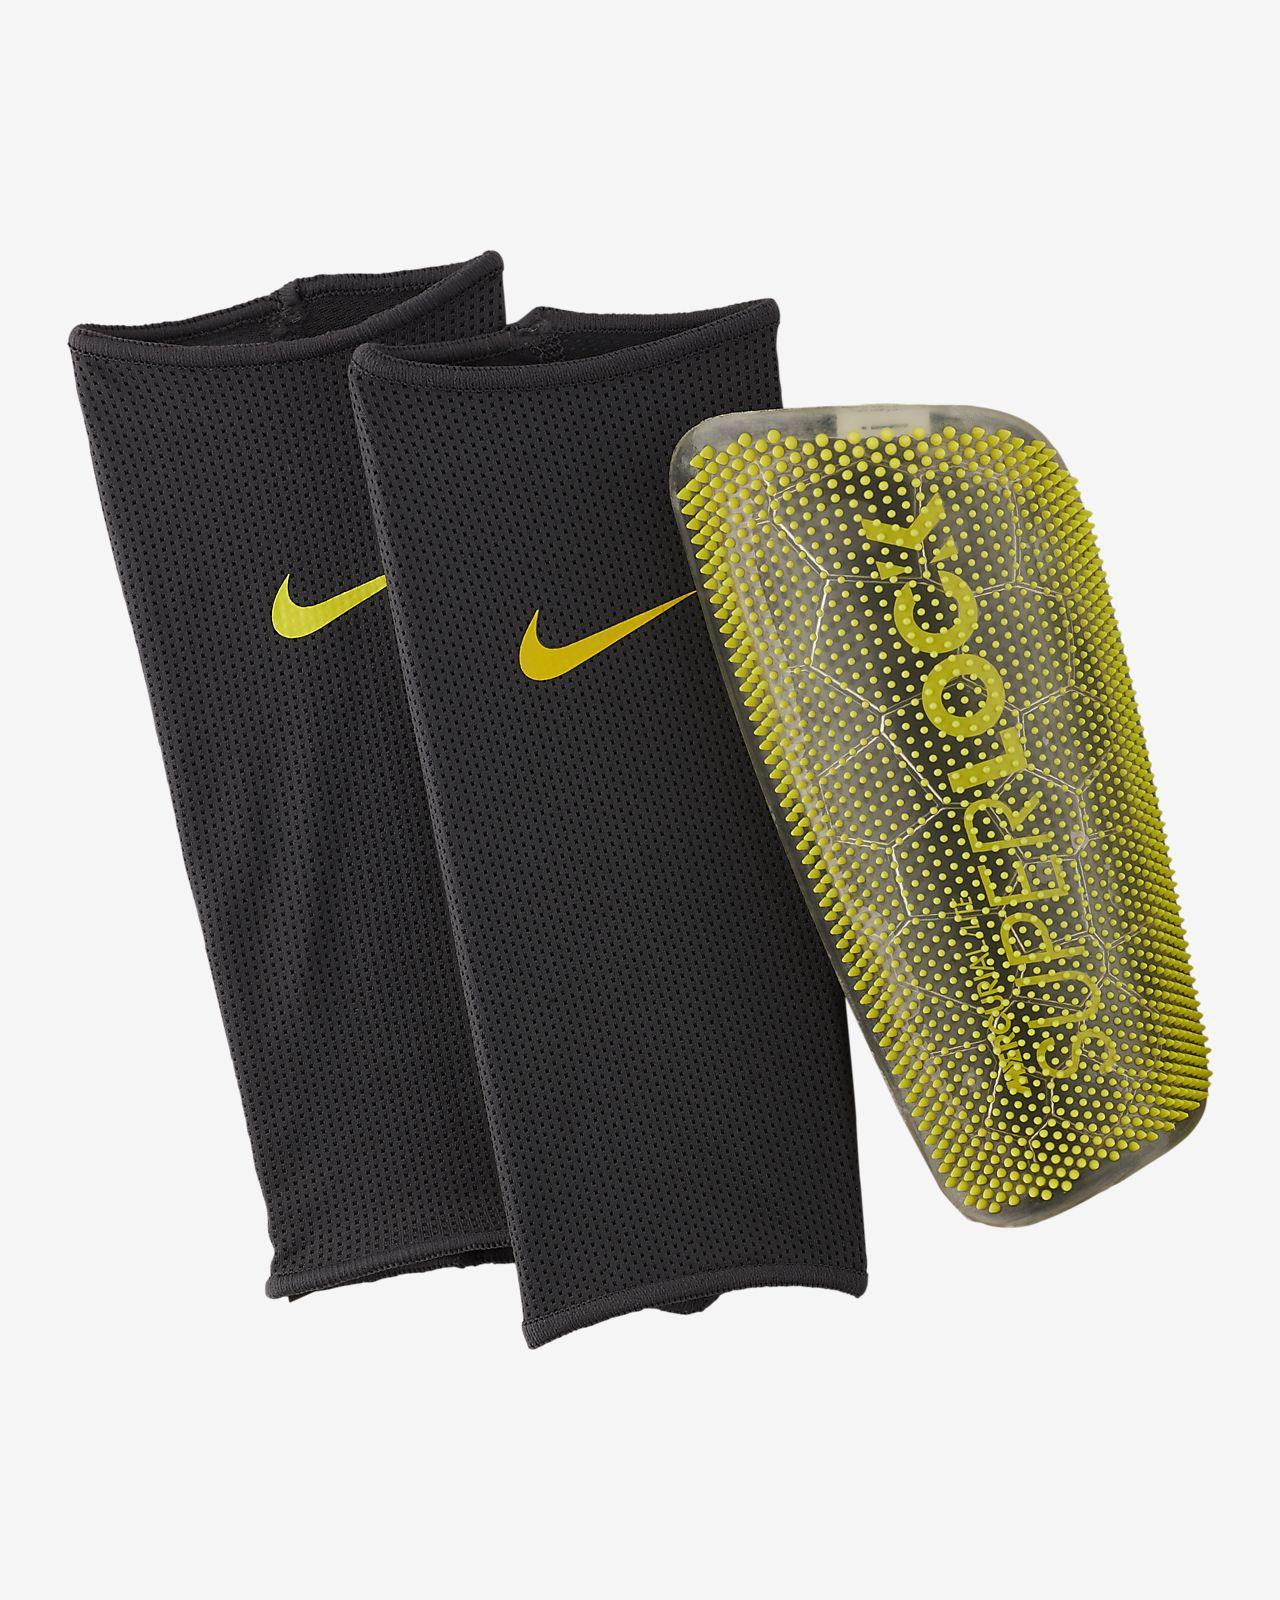 Nike Mercurial Lite SuperLock Football Shinguards